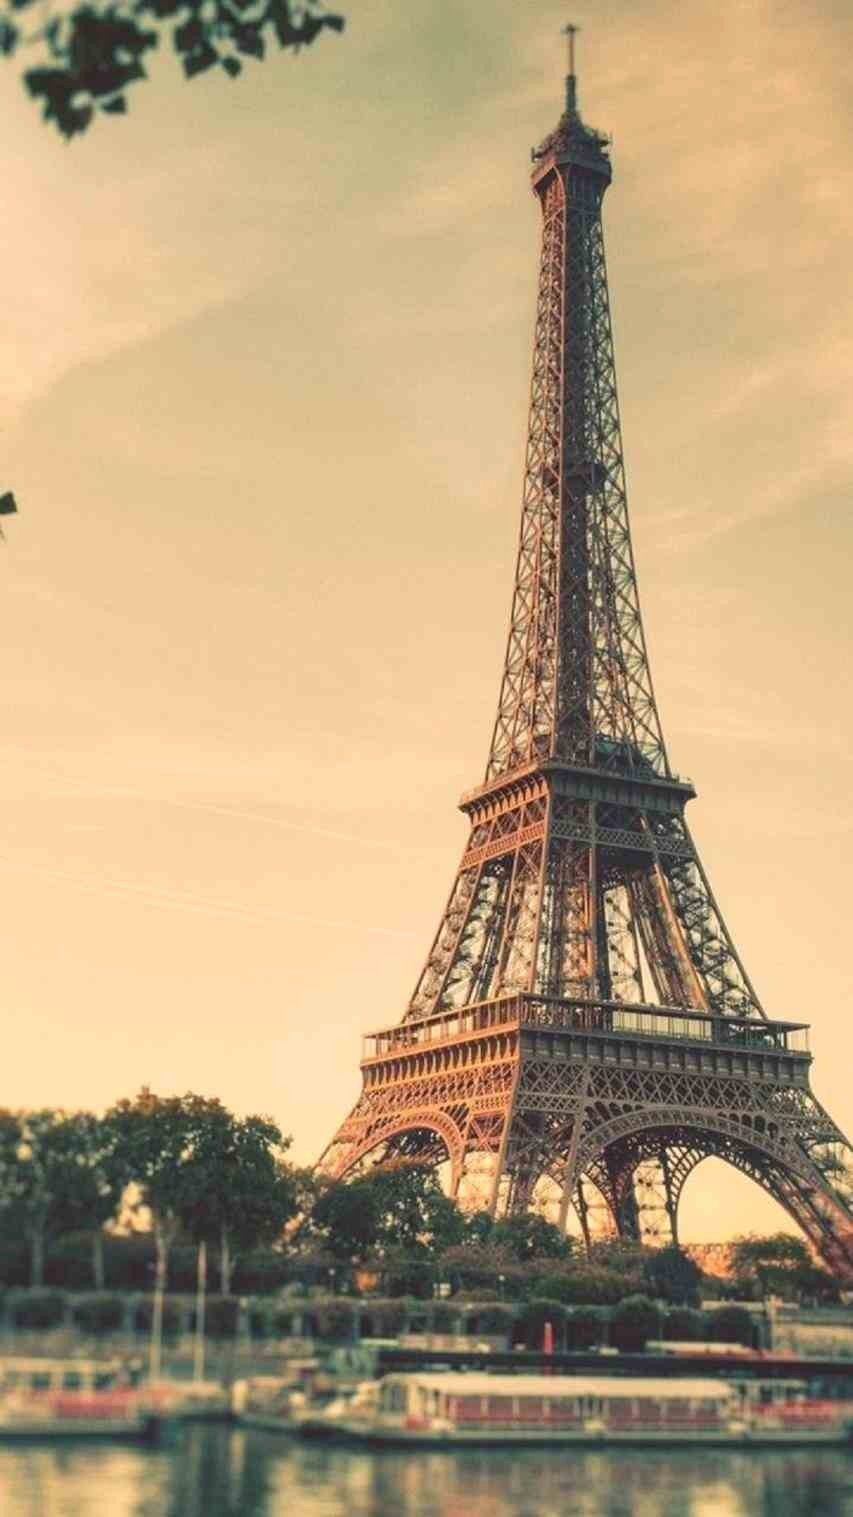 Shabby Paris Wallpaper Tumblr Iphone Vintage Romantic